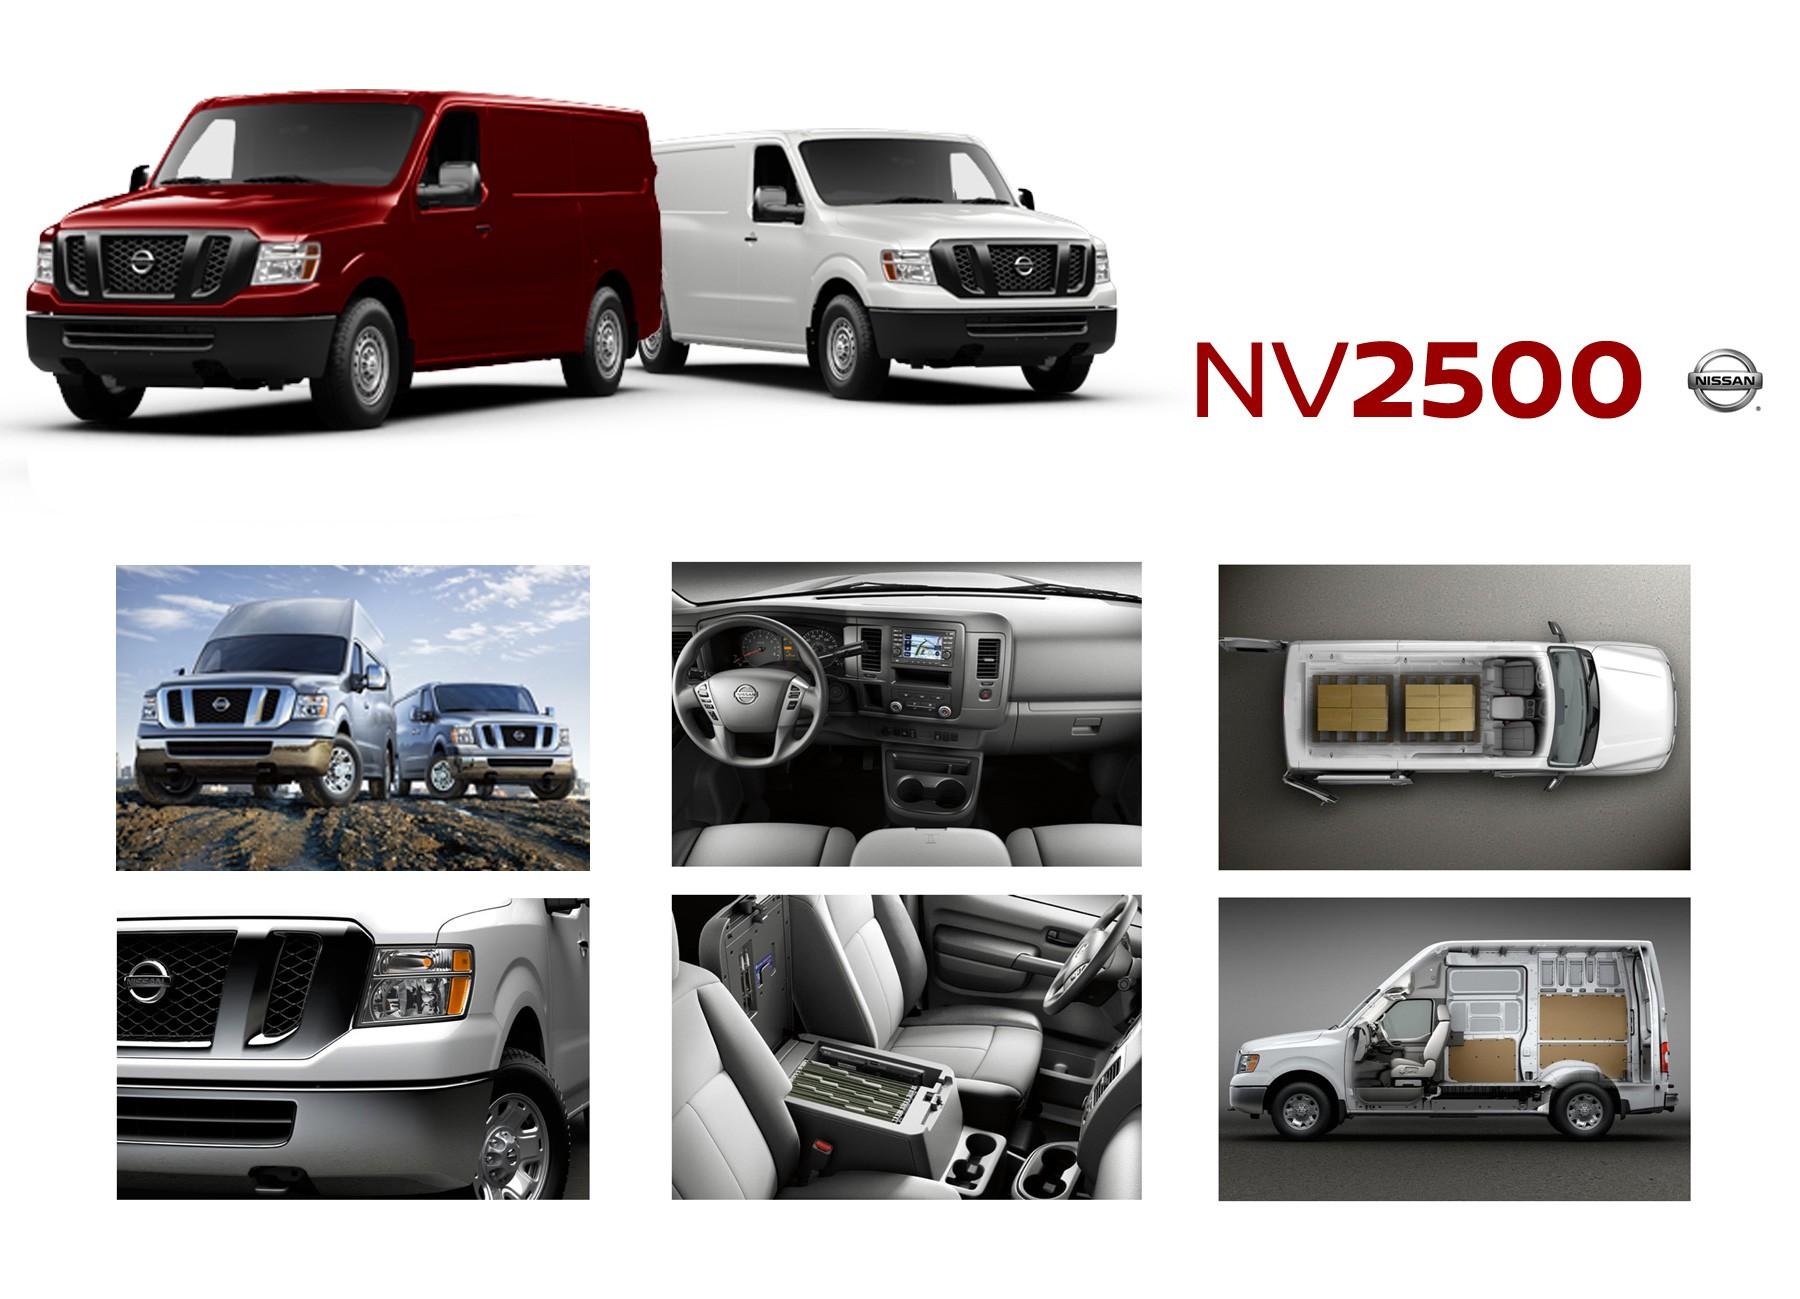 New Nissan NV2500